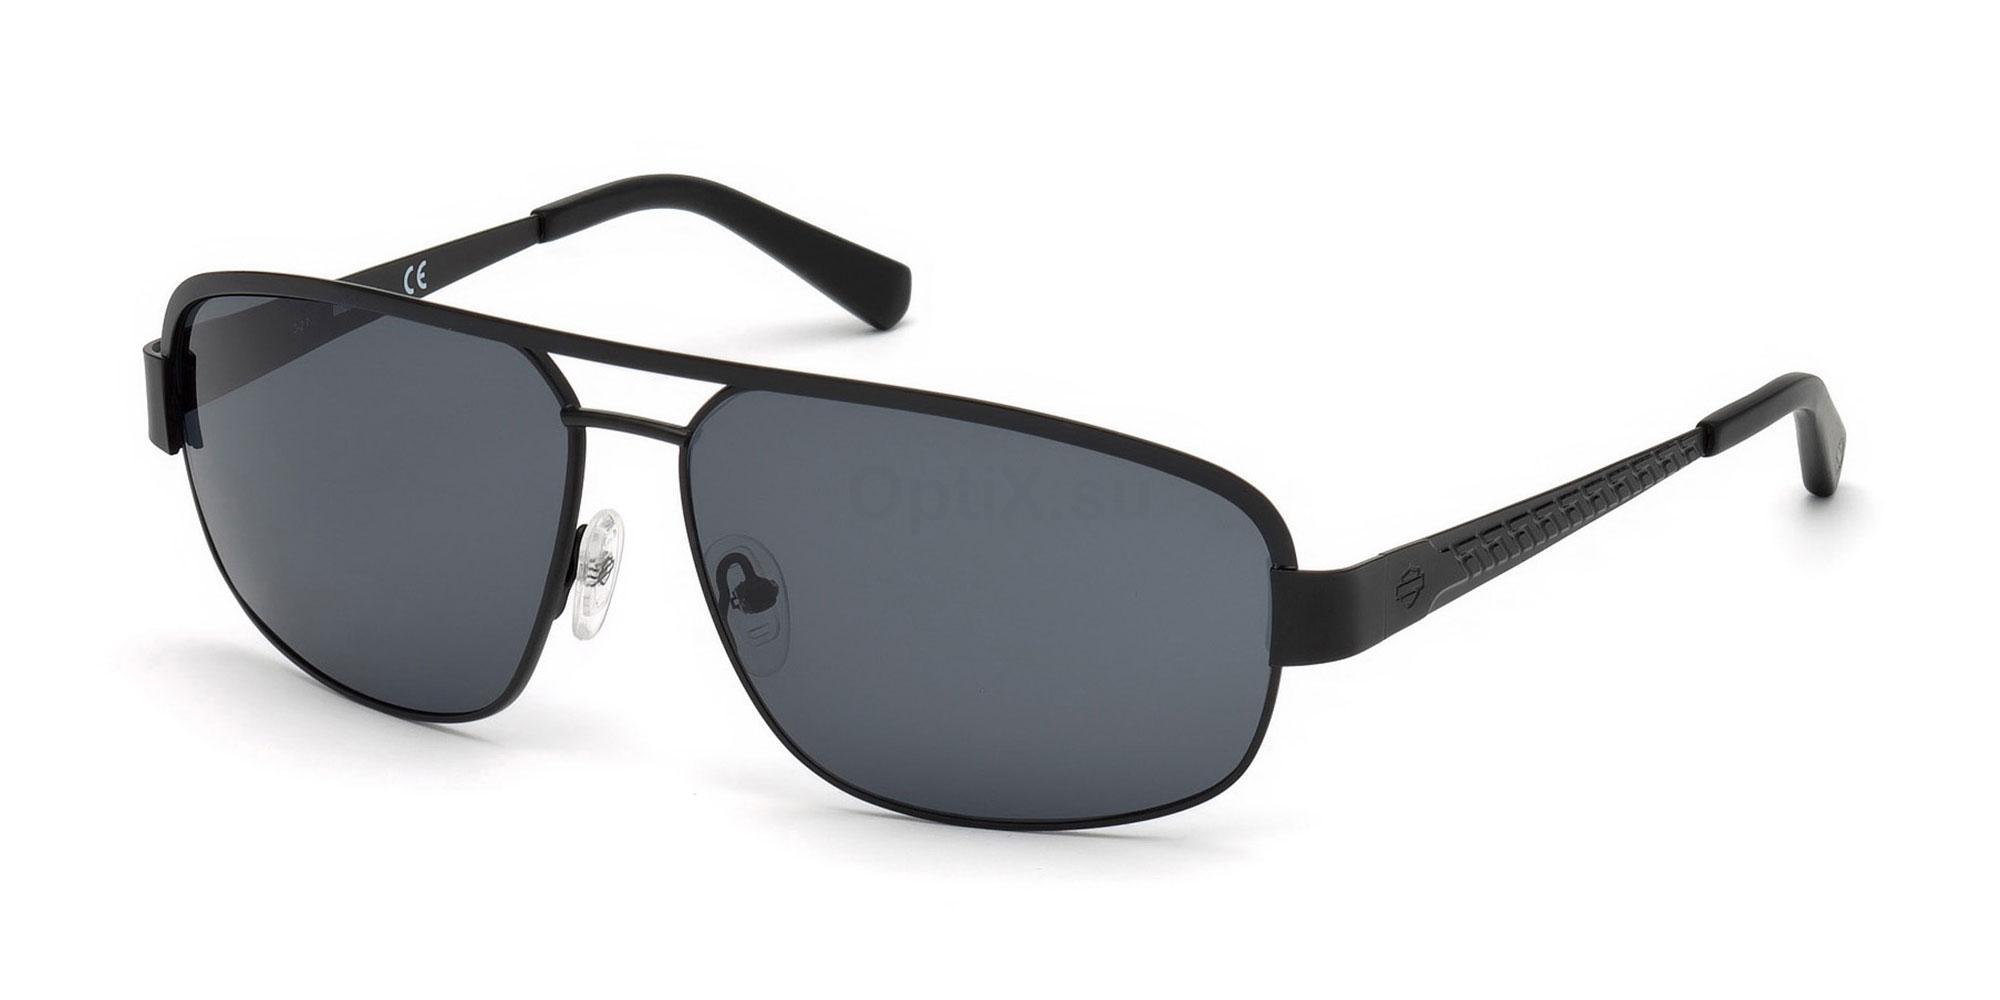 02A HD0924X Sunglasses, Harley Davidson